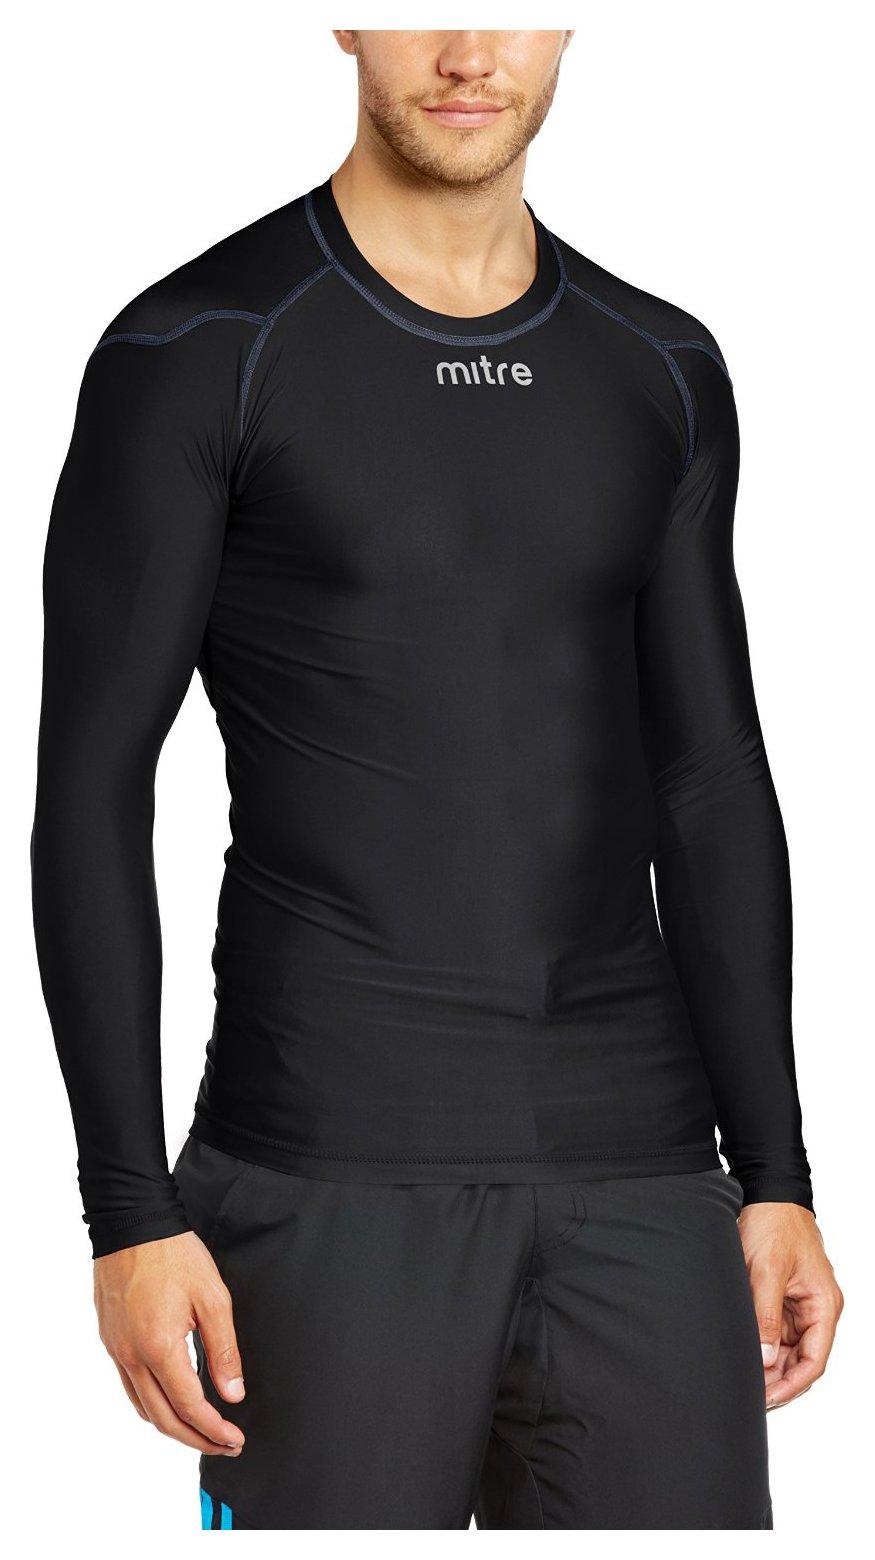 Image of Mitre - Base Layer Jersey Black - Large